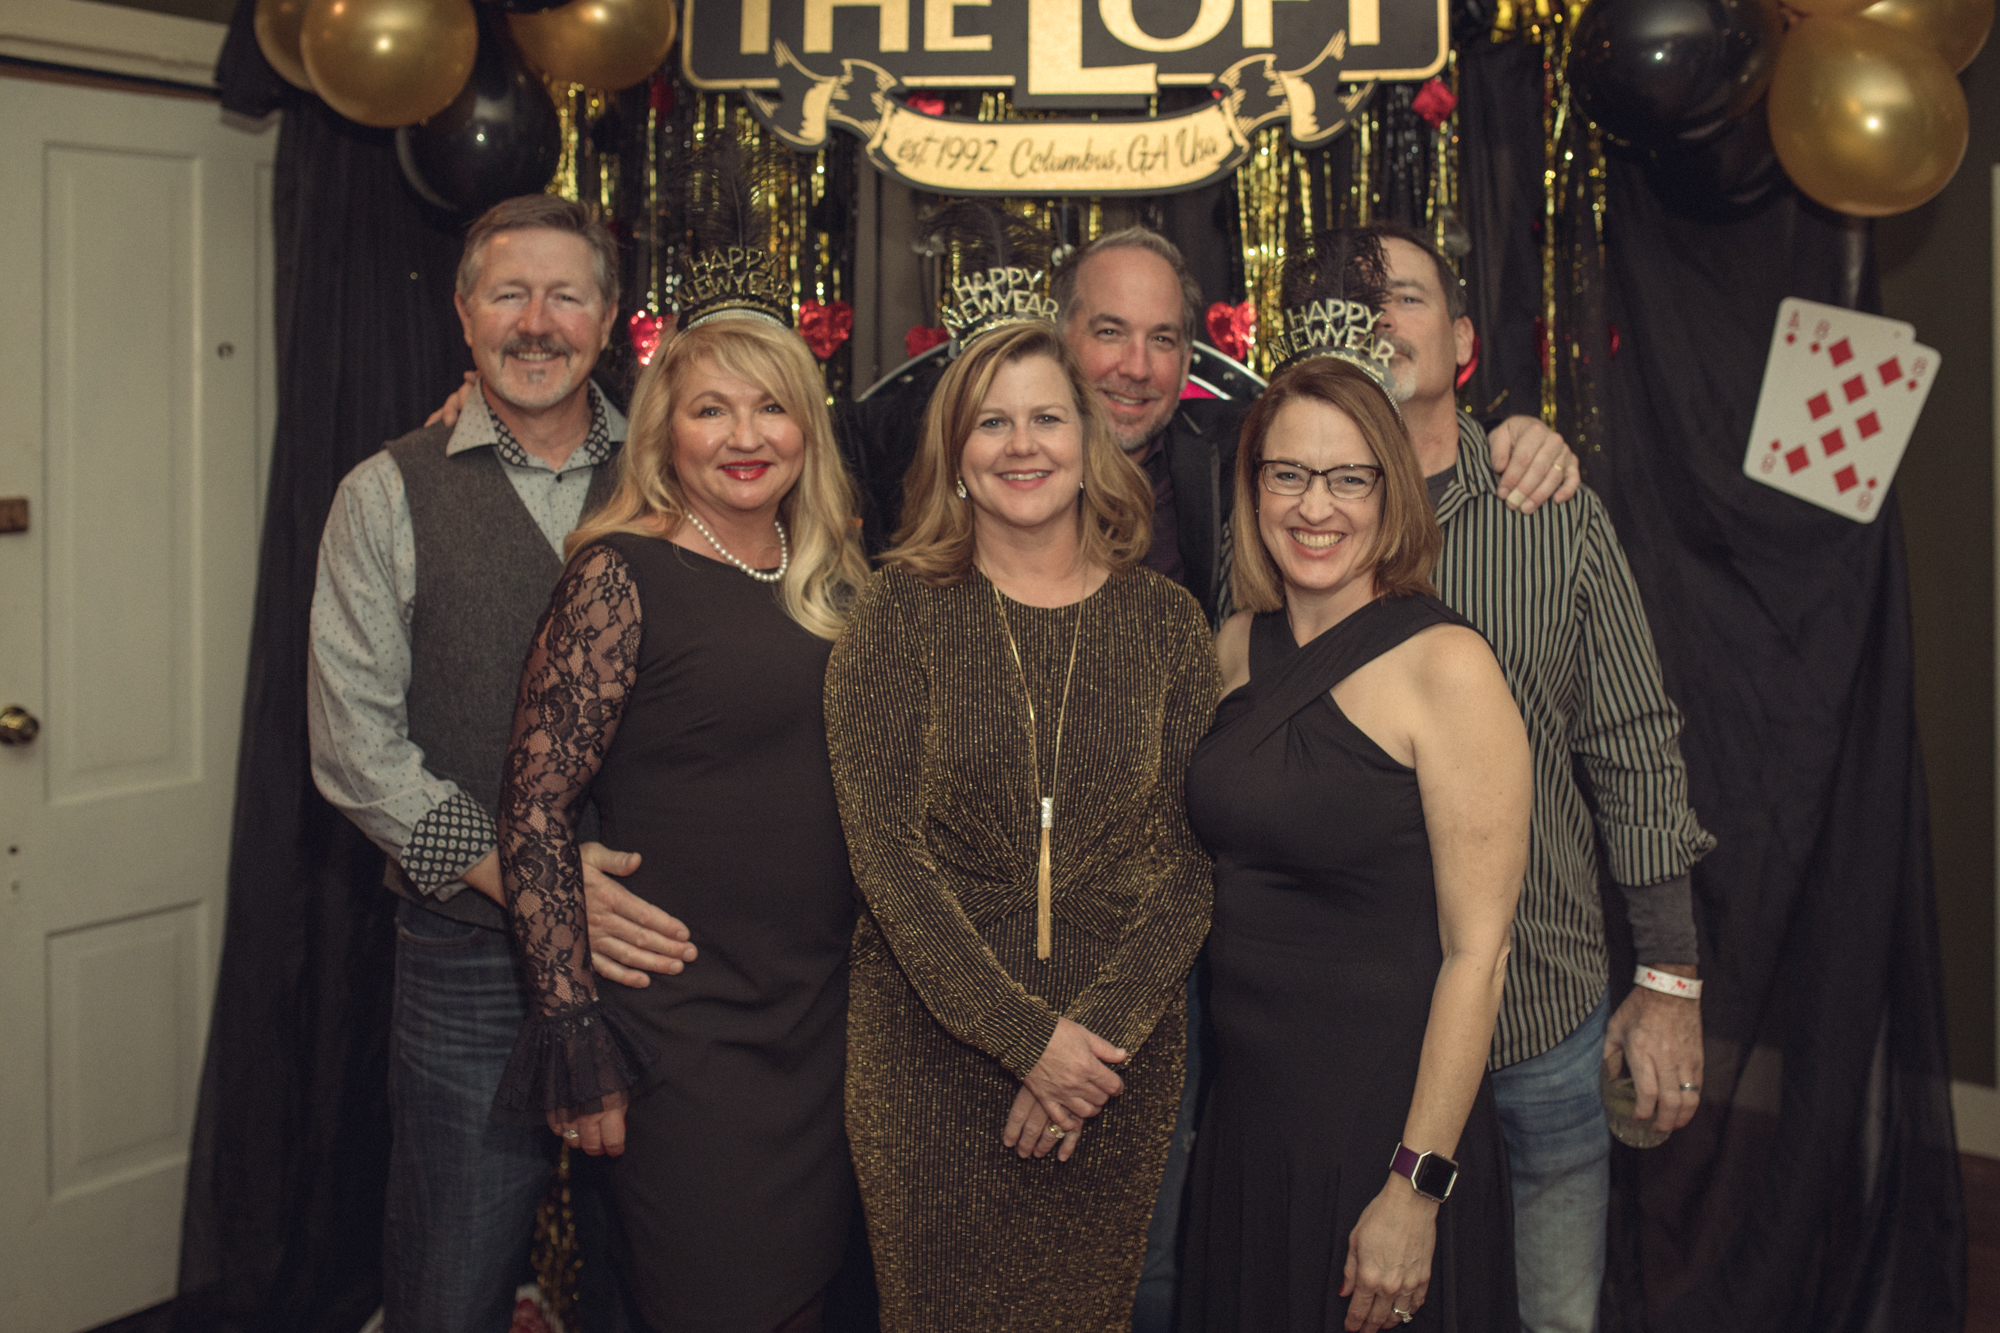 Loft new years-29.jpg